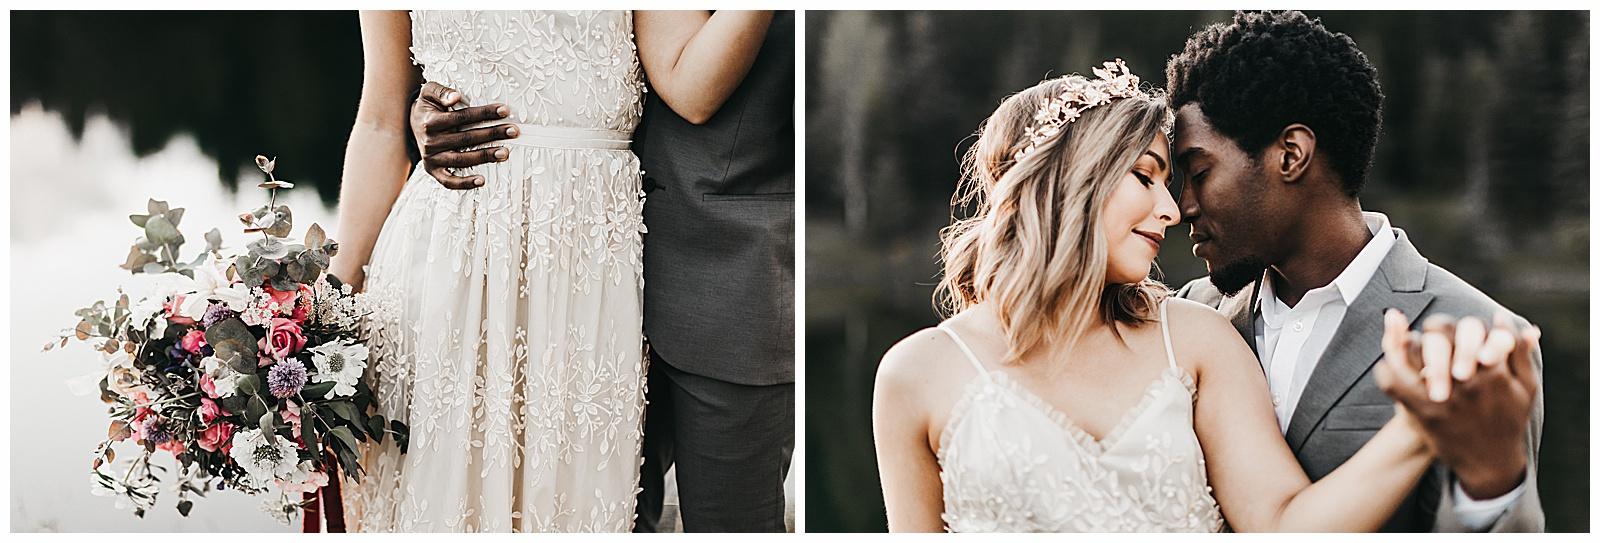 seattle-wedding-photographer-seattle-elopement-photographer-anniezav_0030.jpg